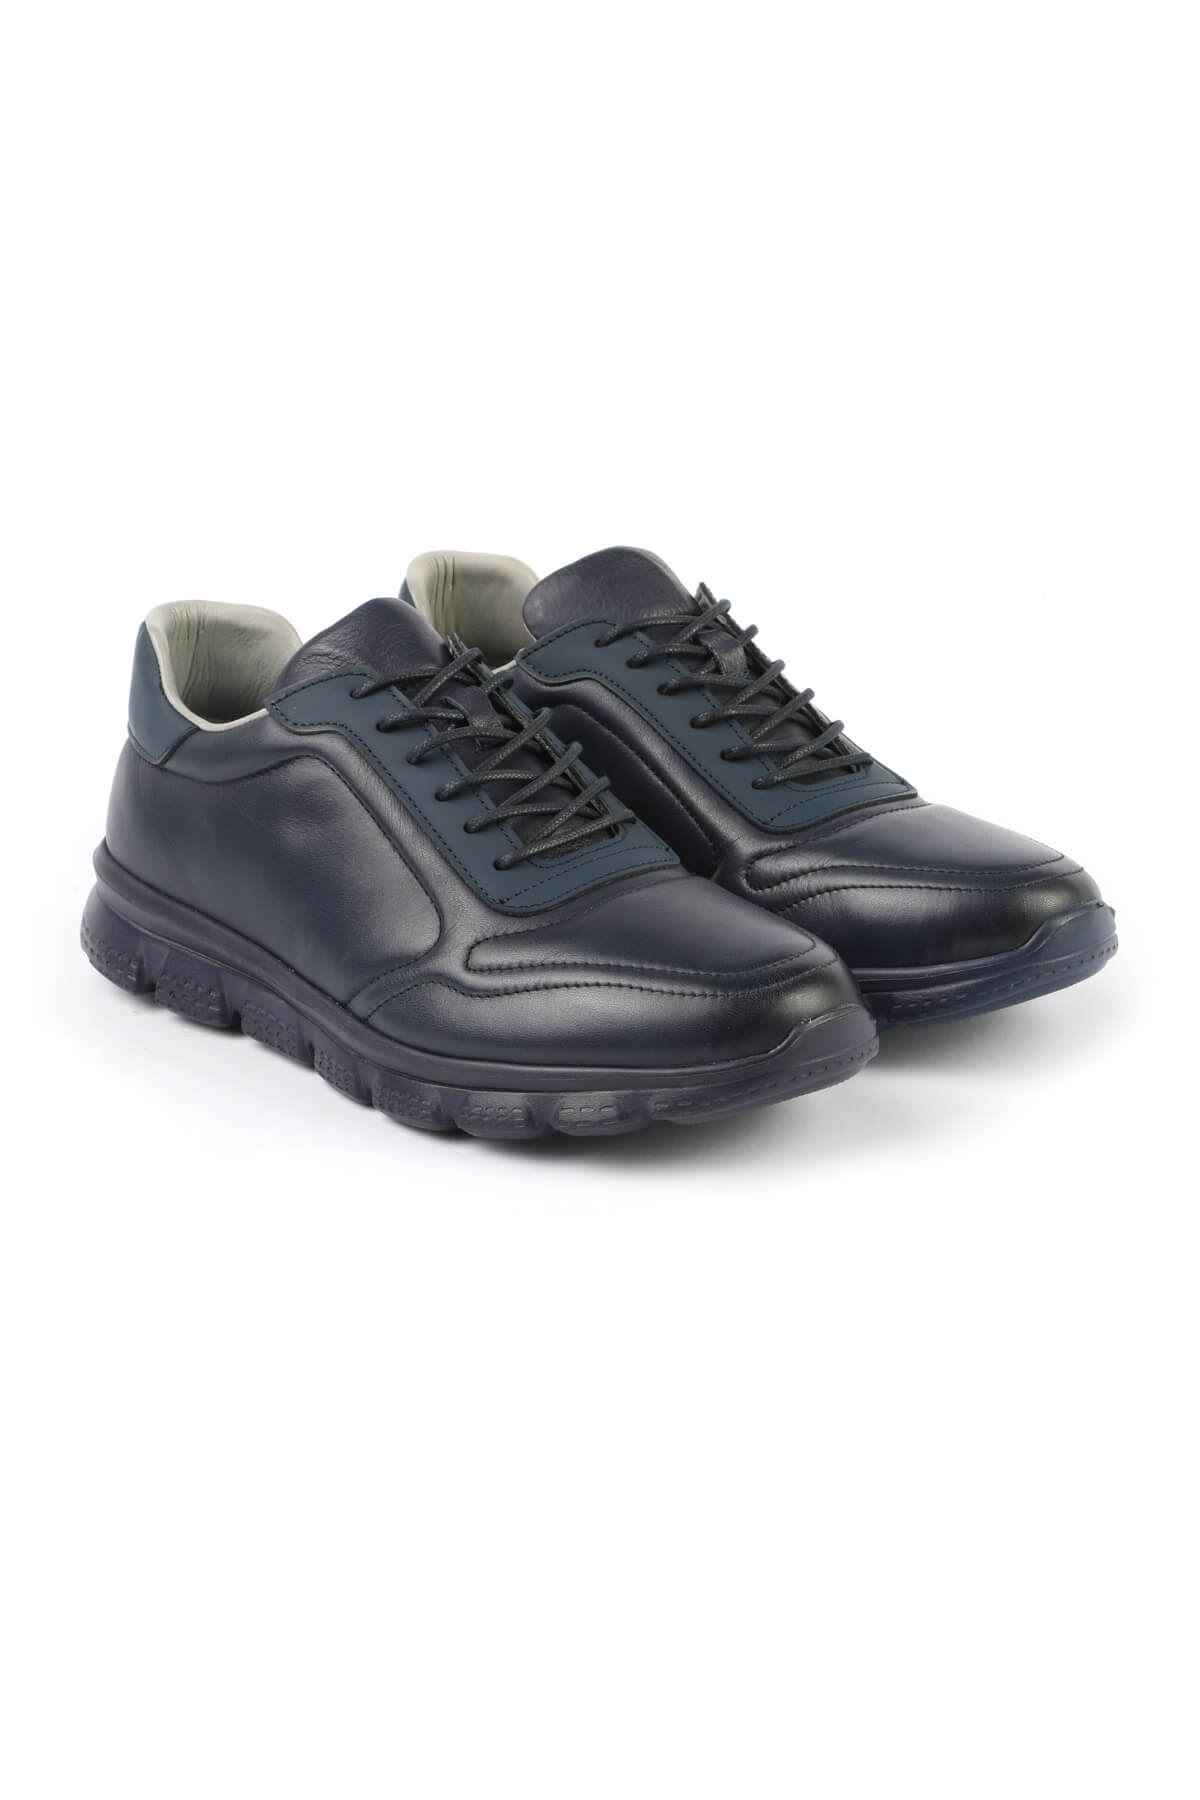 Libero 3121 Navy Blue Sport Shoes